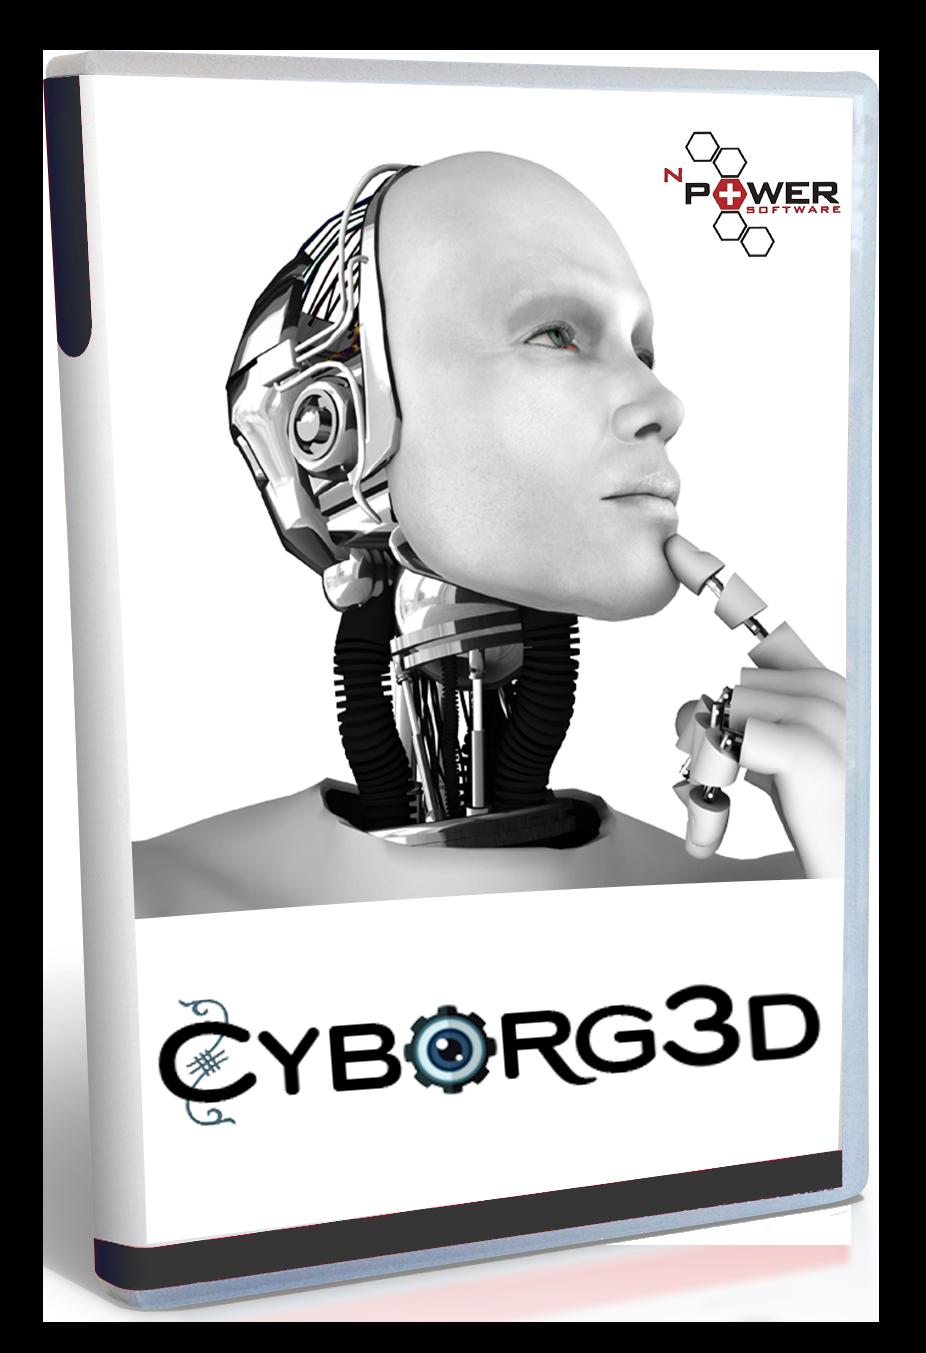 Cyborg3D Product Box